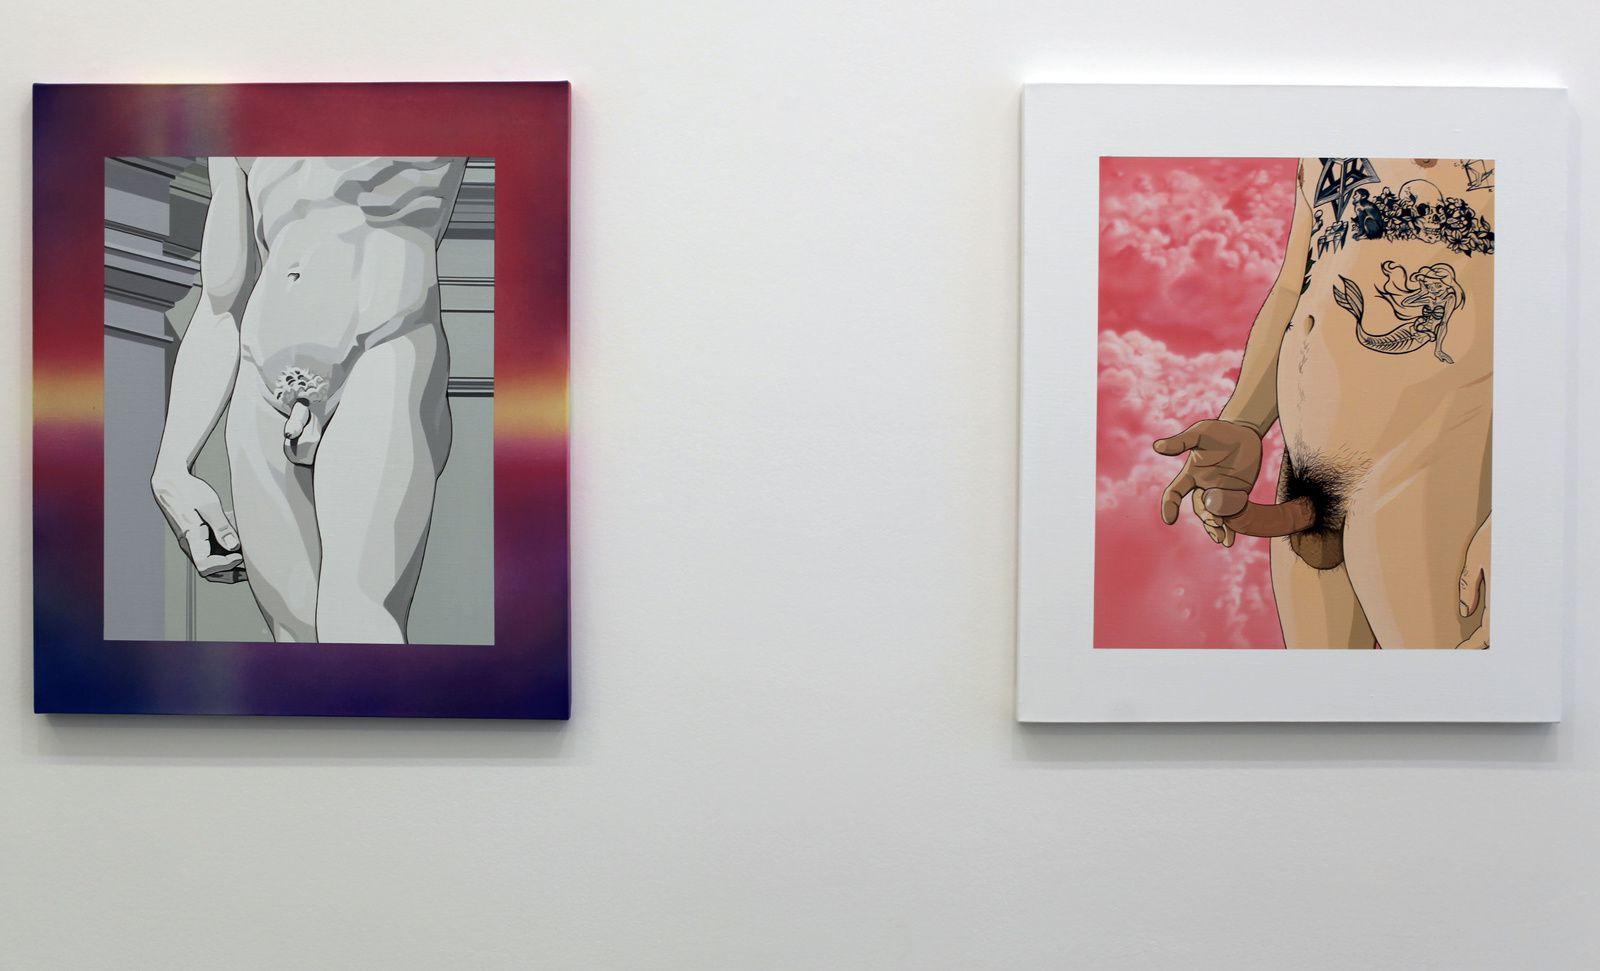 """Aesthetics of Balance - Left"", 2017 et ""Aesthetics of Balance - Right"", 2017 de CHEN FEI - Courtesy Galerie Perrotin © Photo Éric Simon"